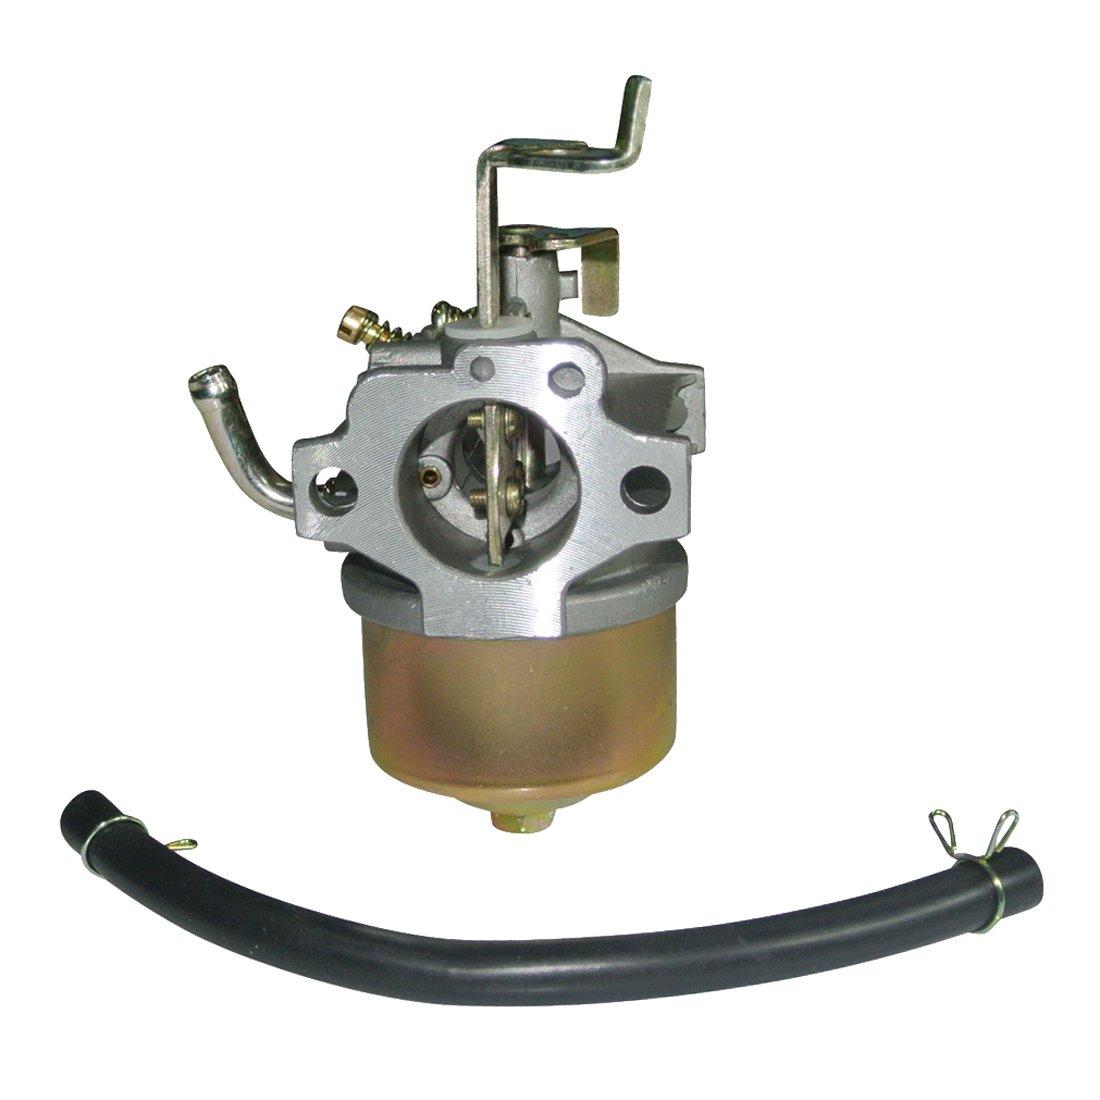 New Generic Carburettor Carburetor Fits Robin Wisconsin Subaru EY20 EY15 WI-185 Generator